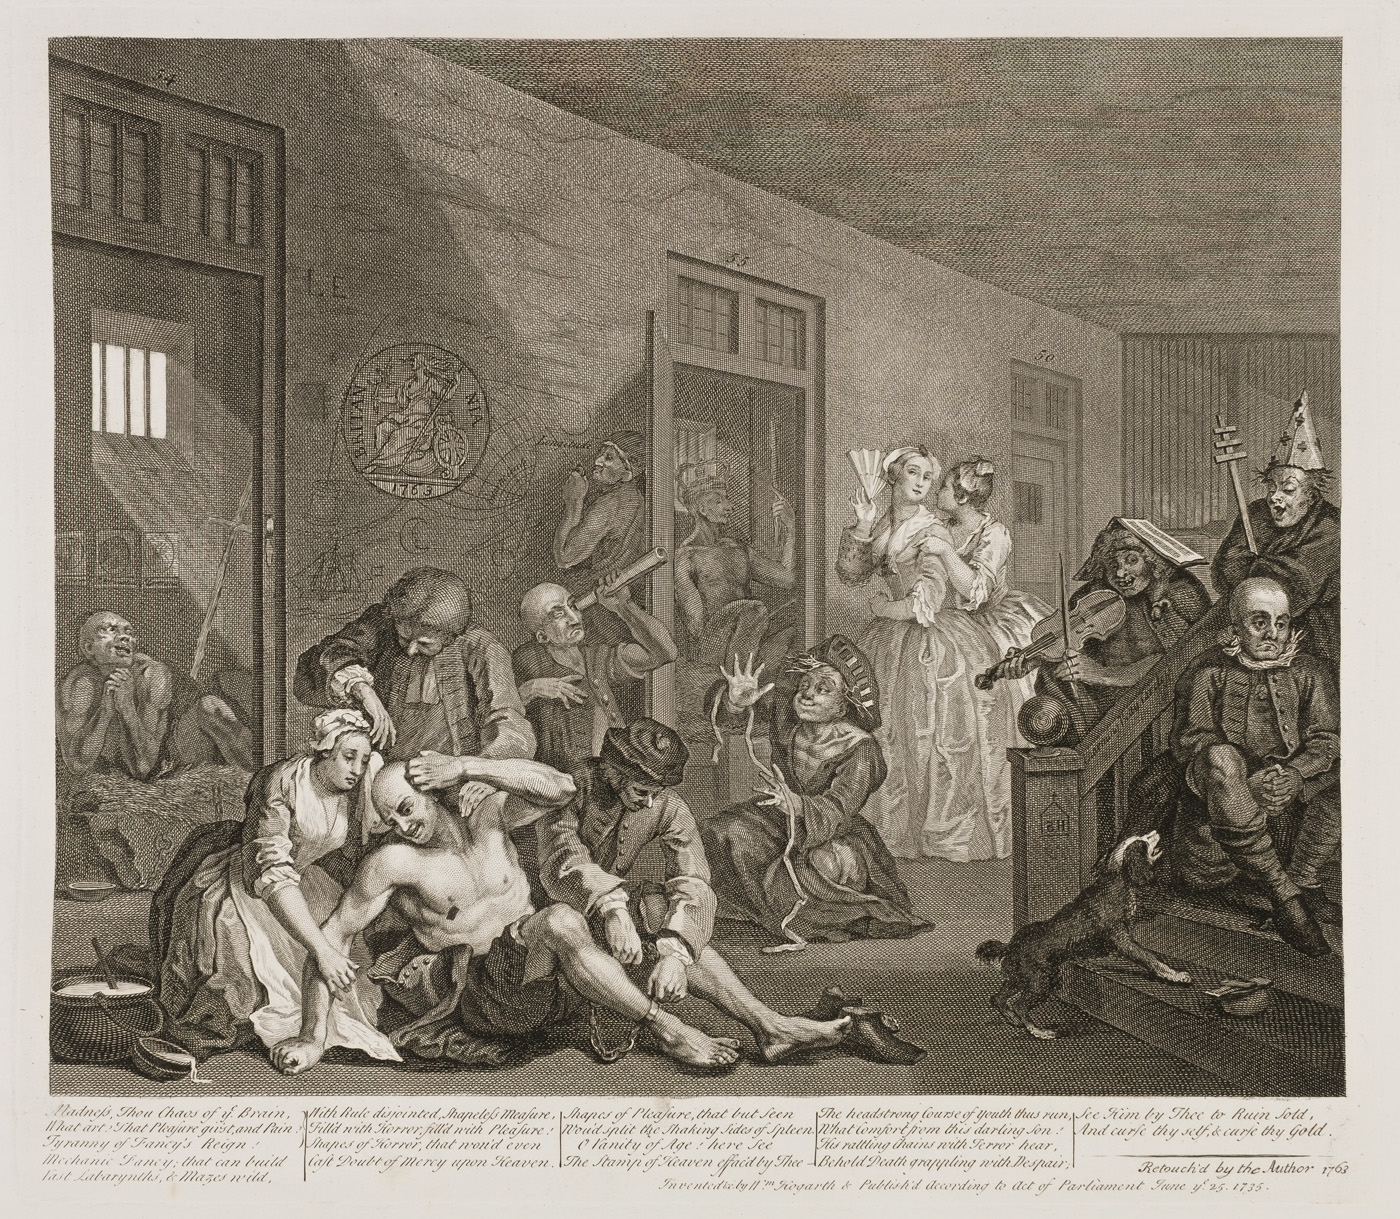 William Hogarth - The Rake's Progress plate 8